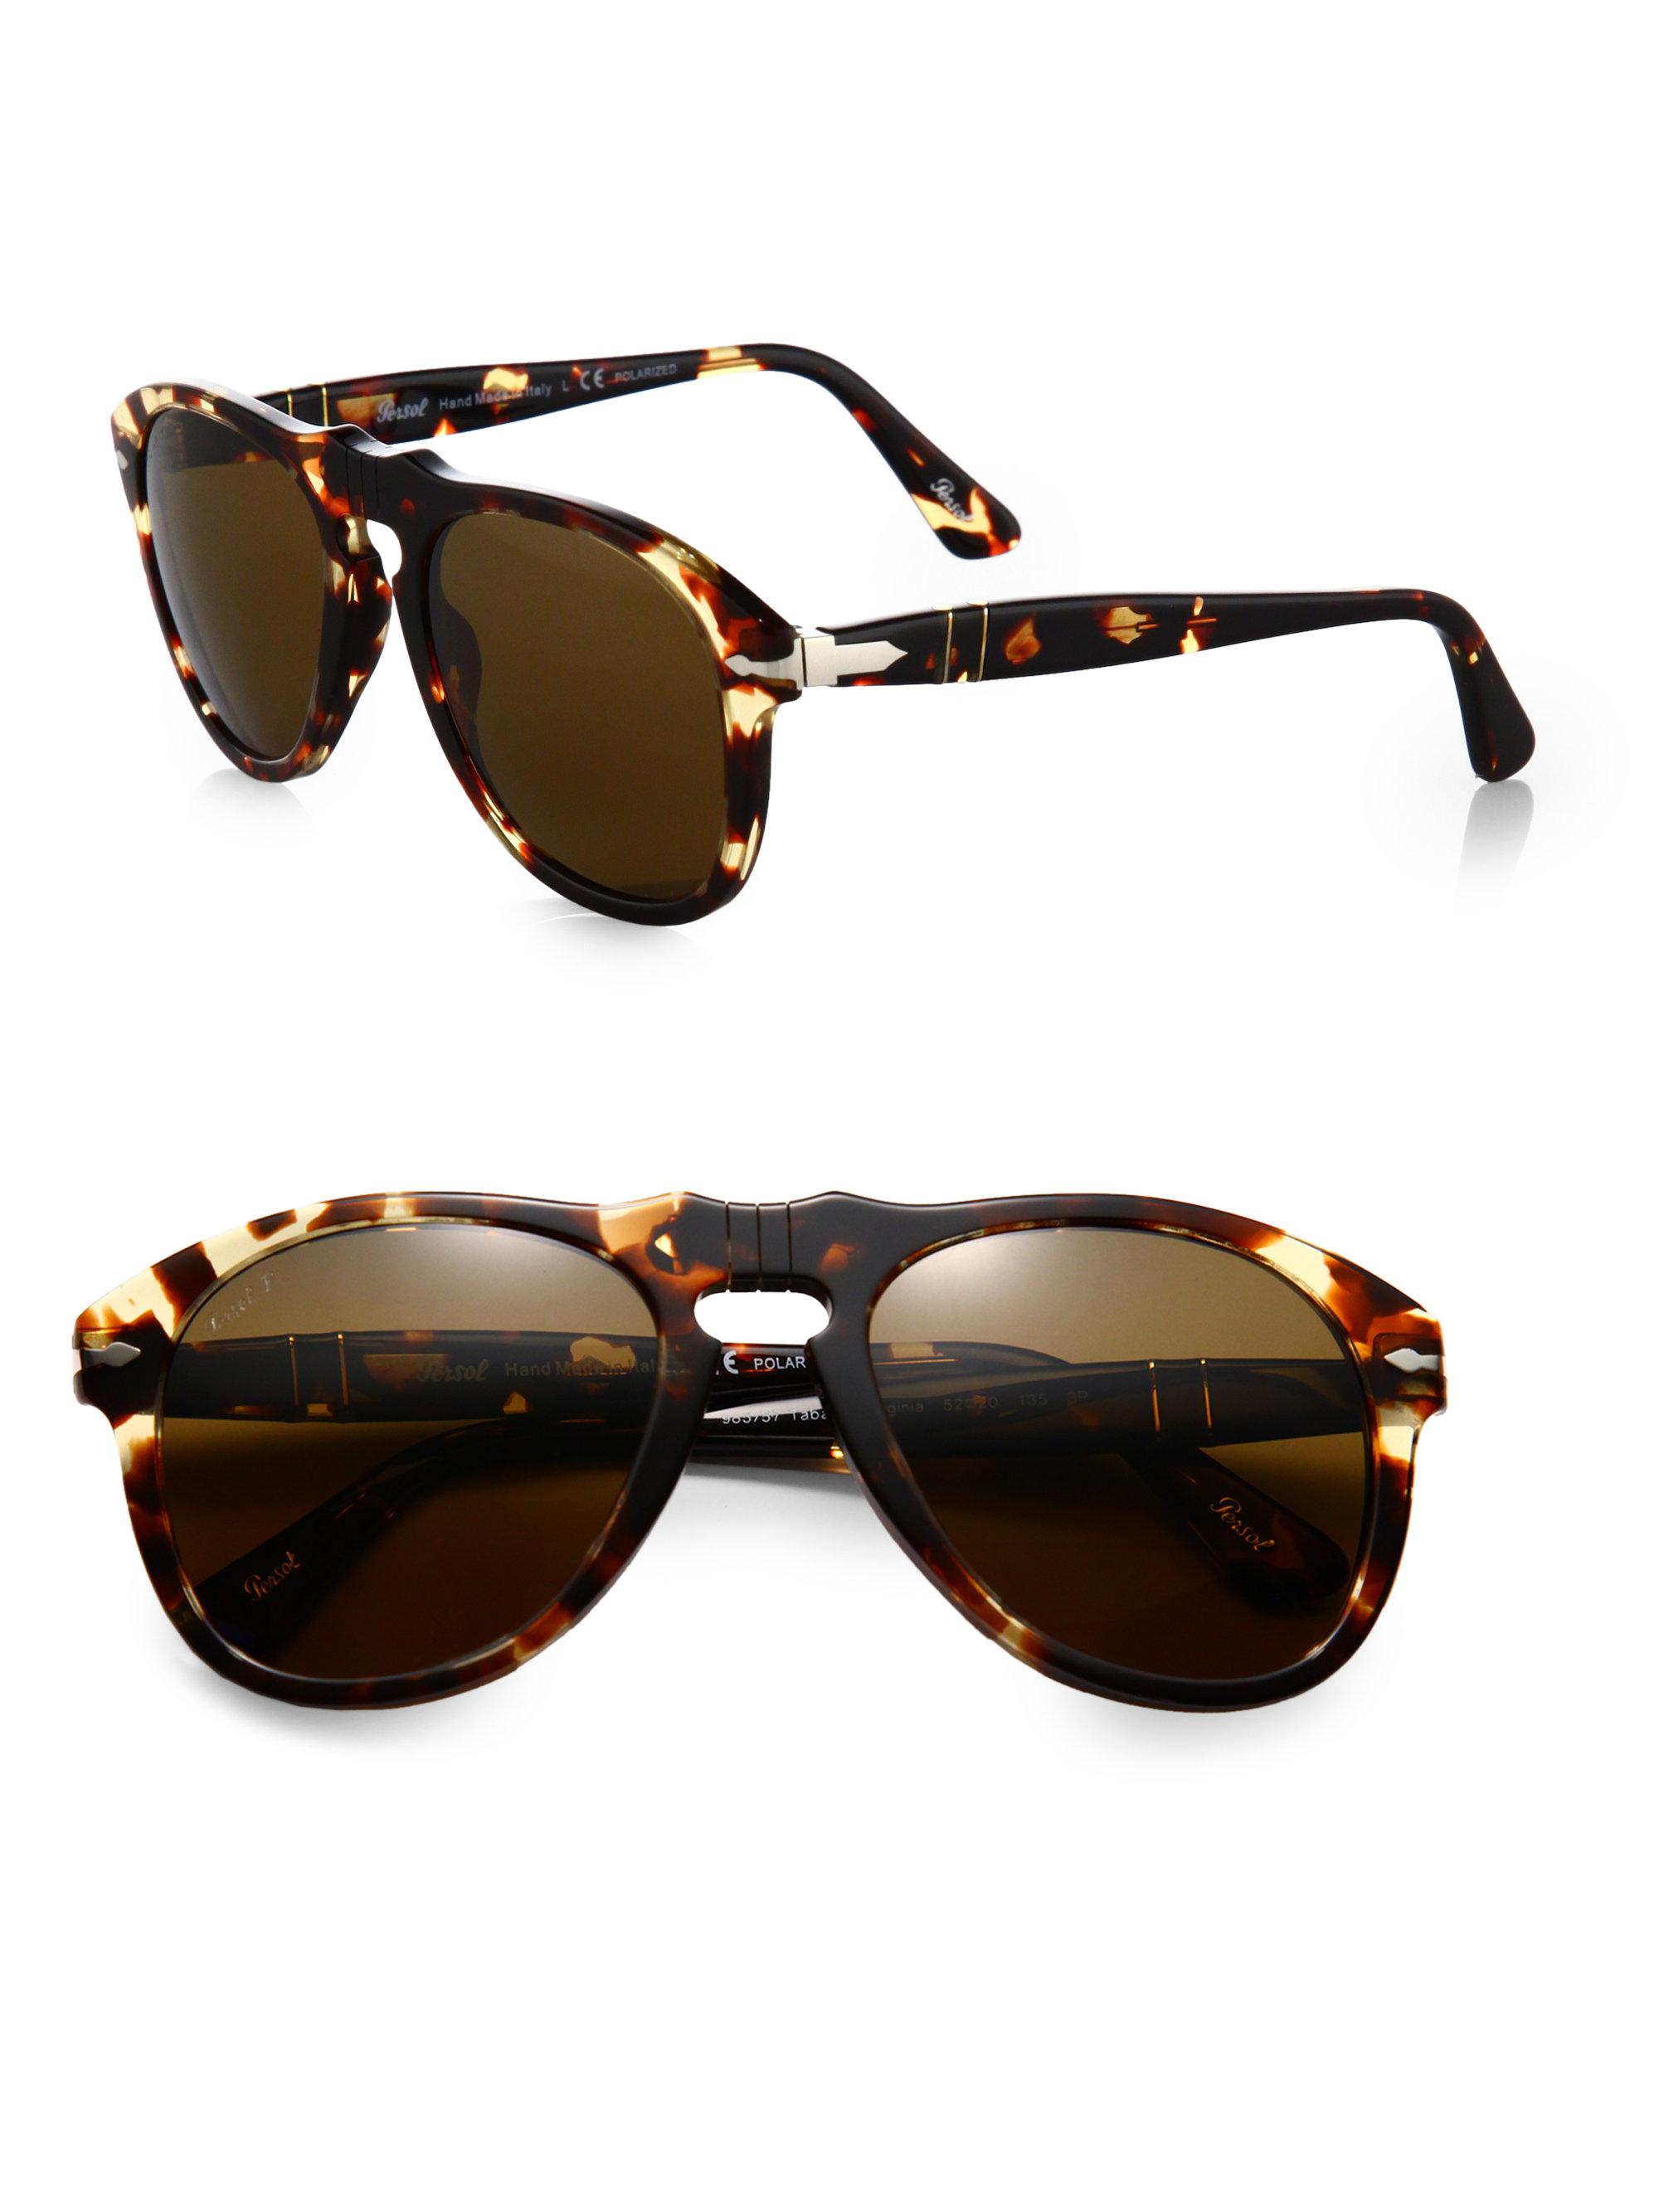 25962a829a9 Vintage Persol Aviator Sunglasses